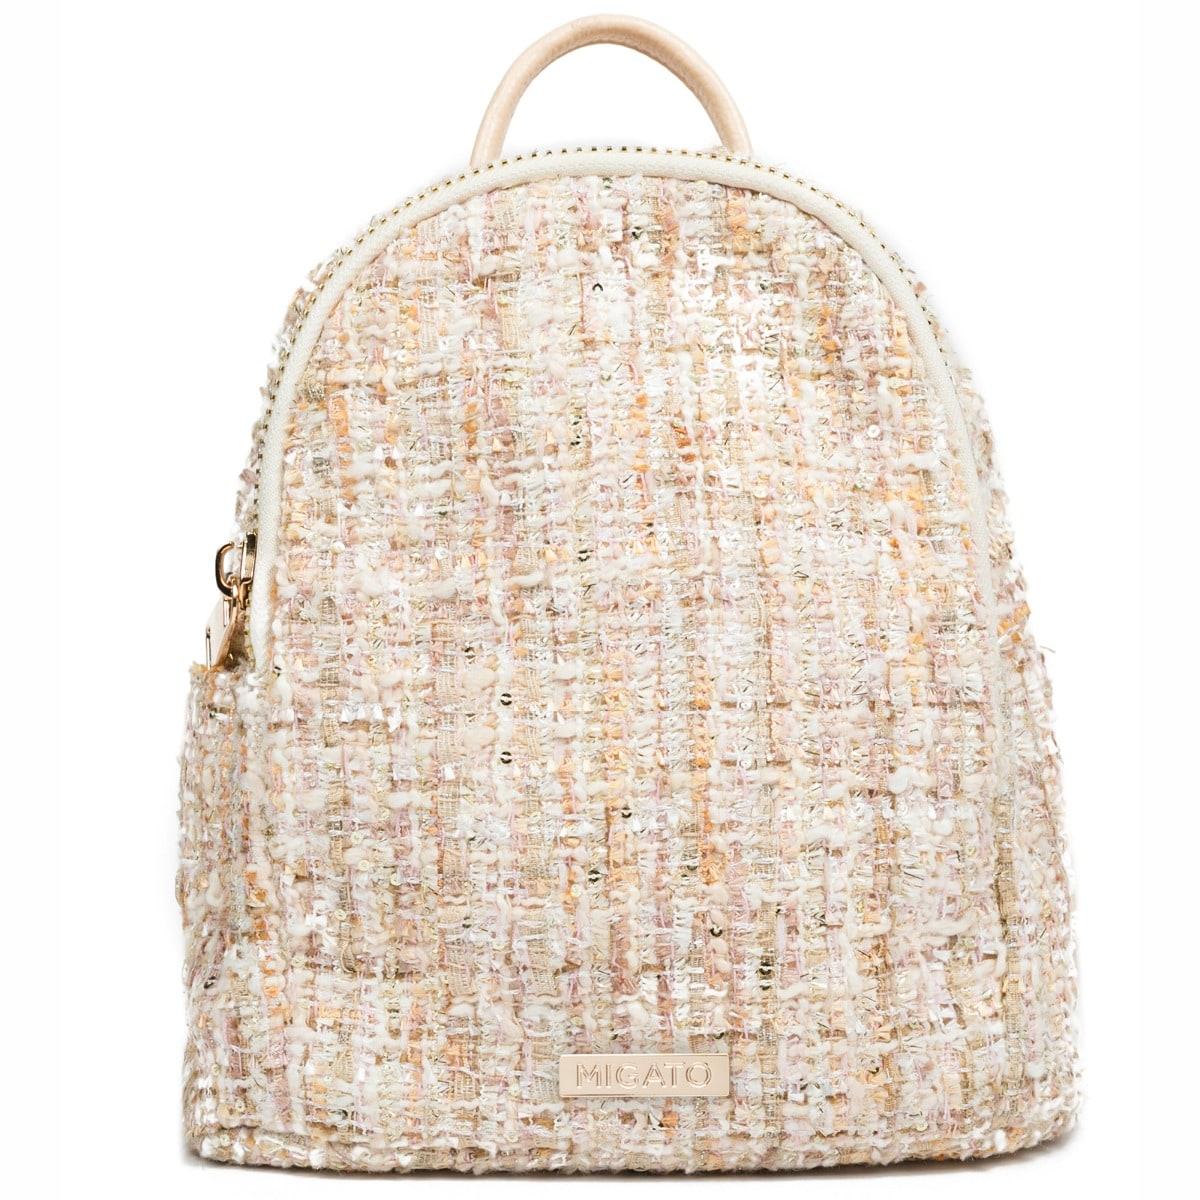 MIGATO FE832 backpack